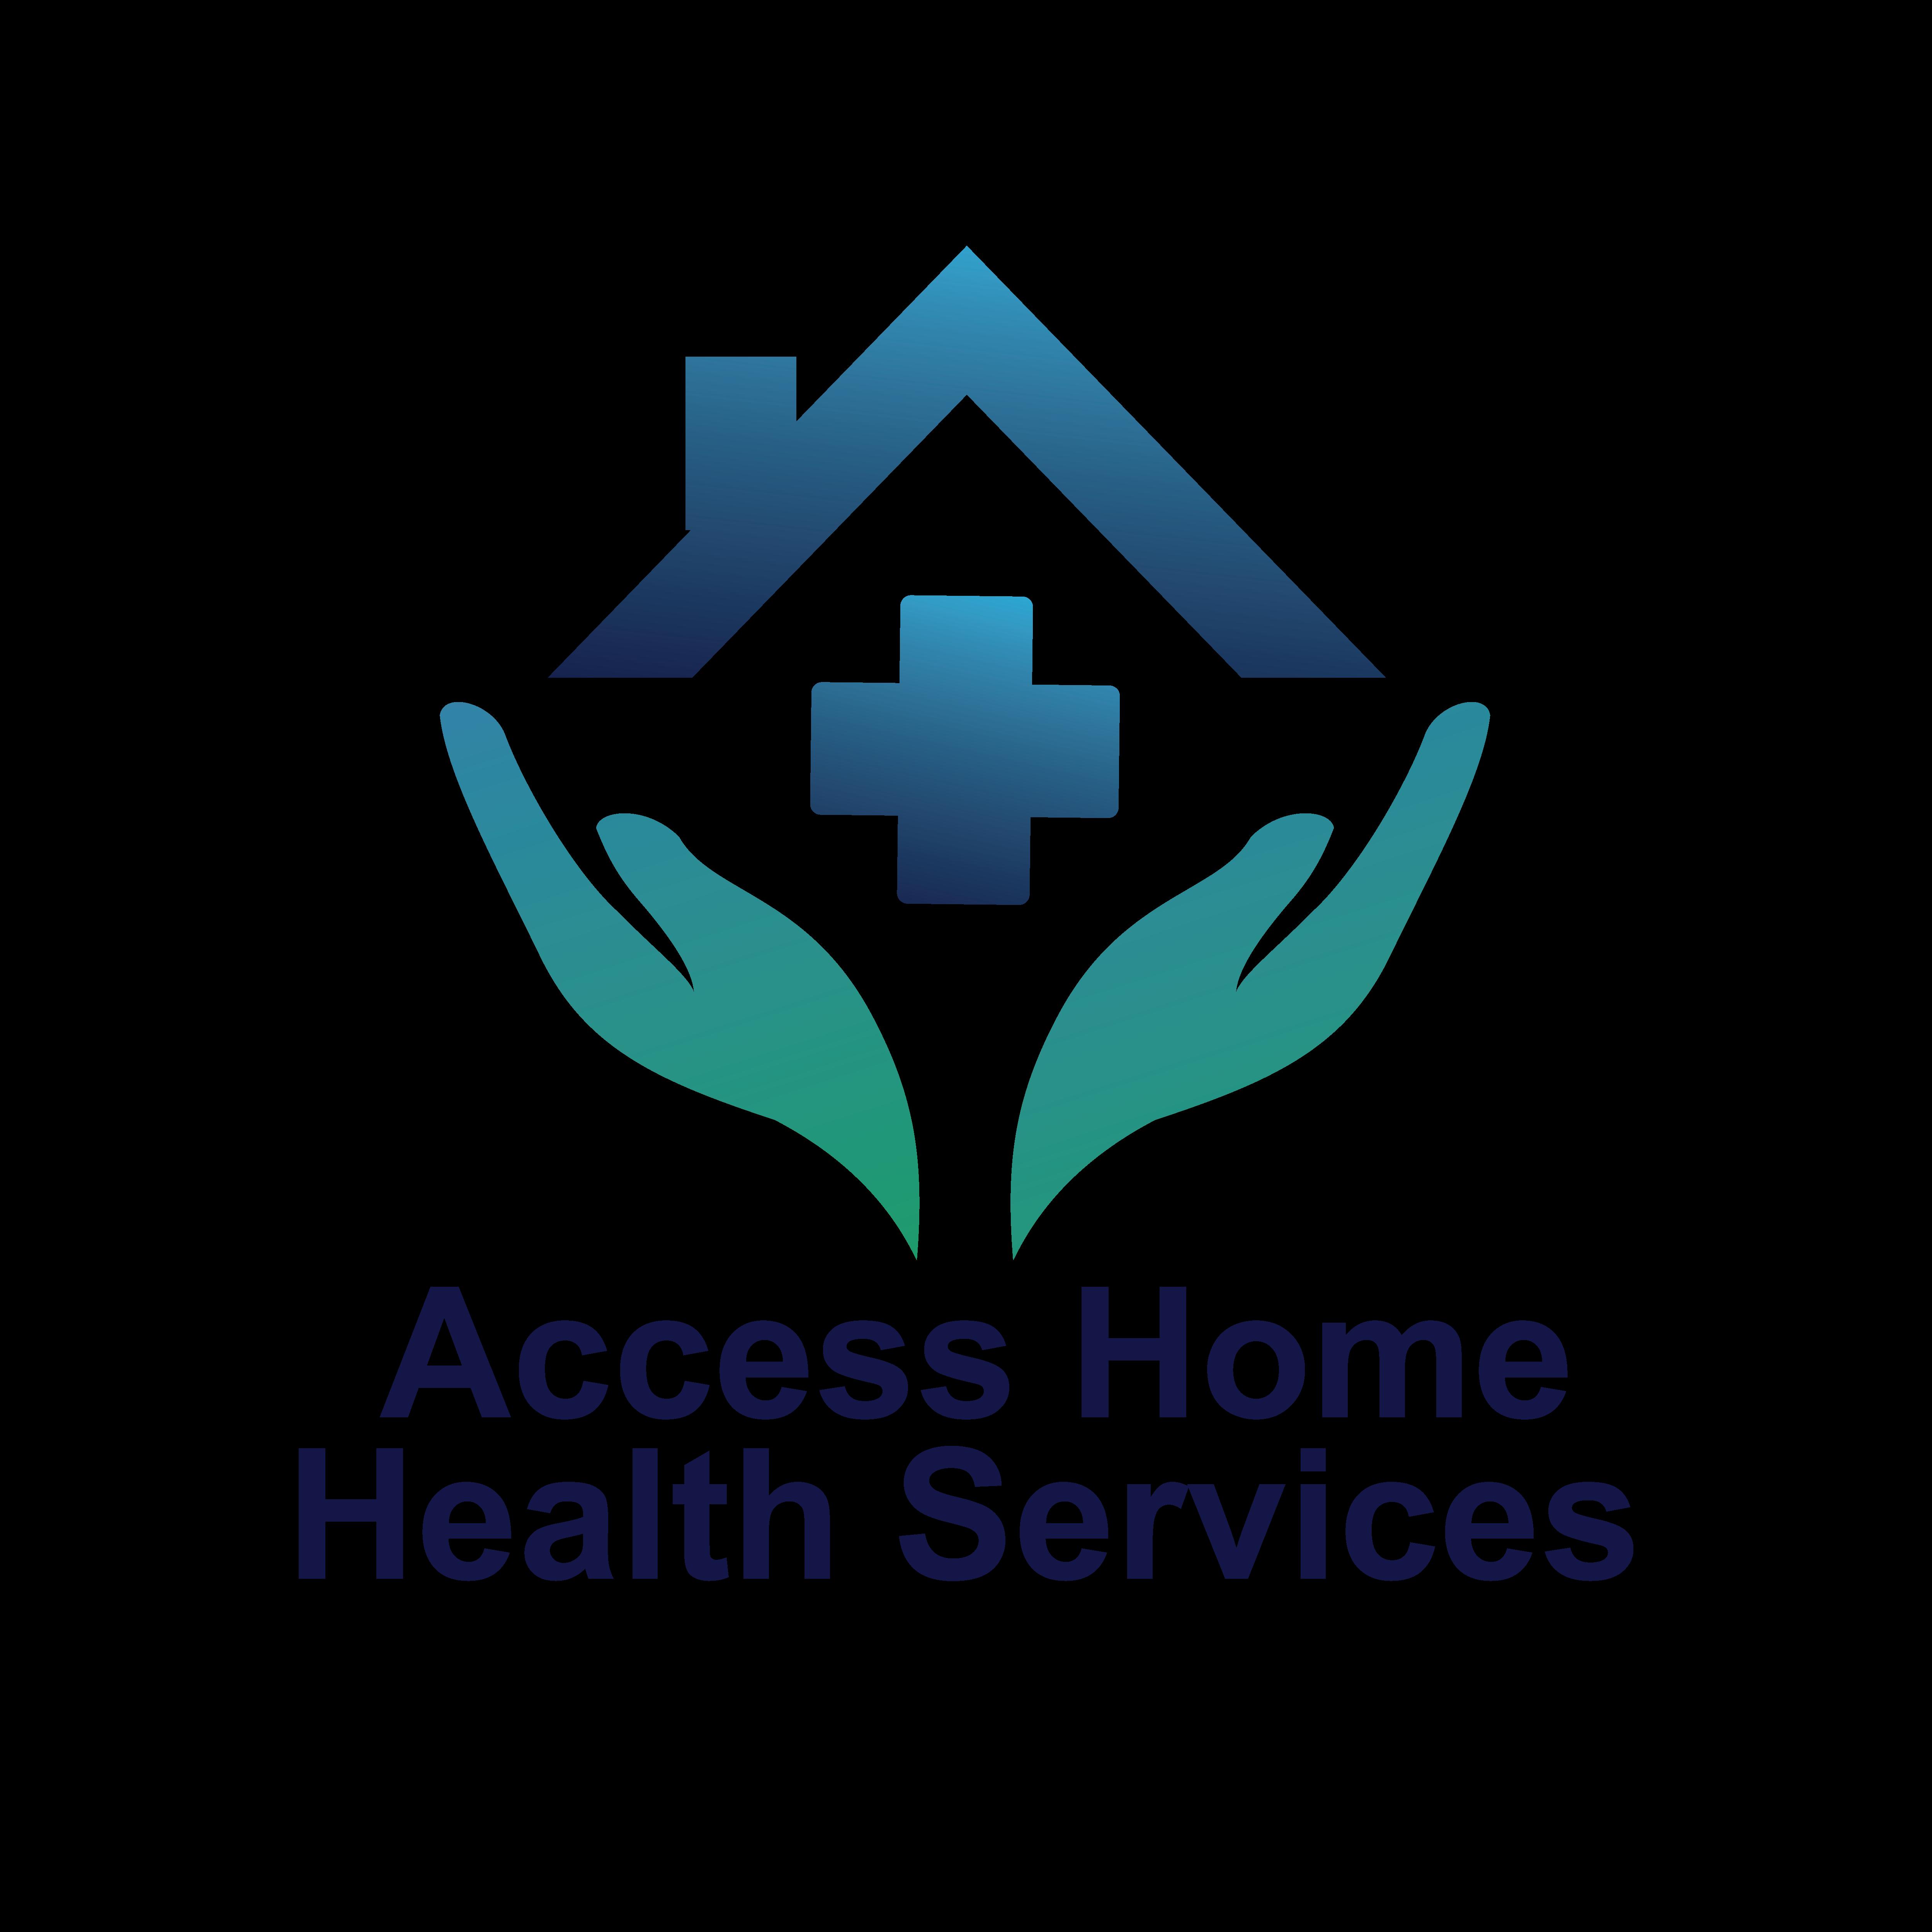 Access Home Health Services Inc.